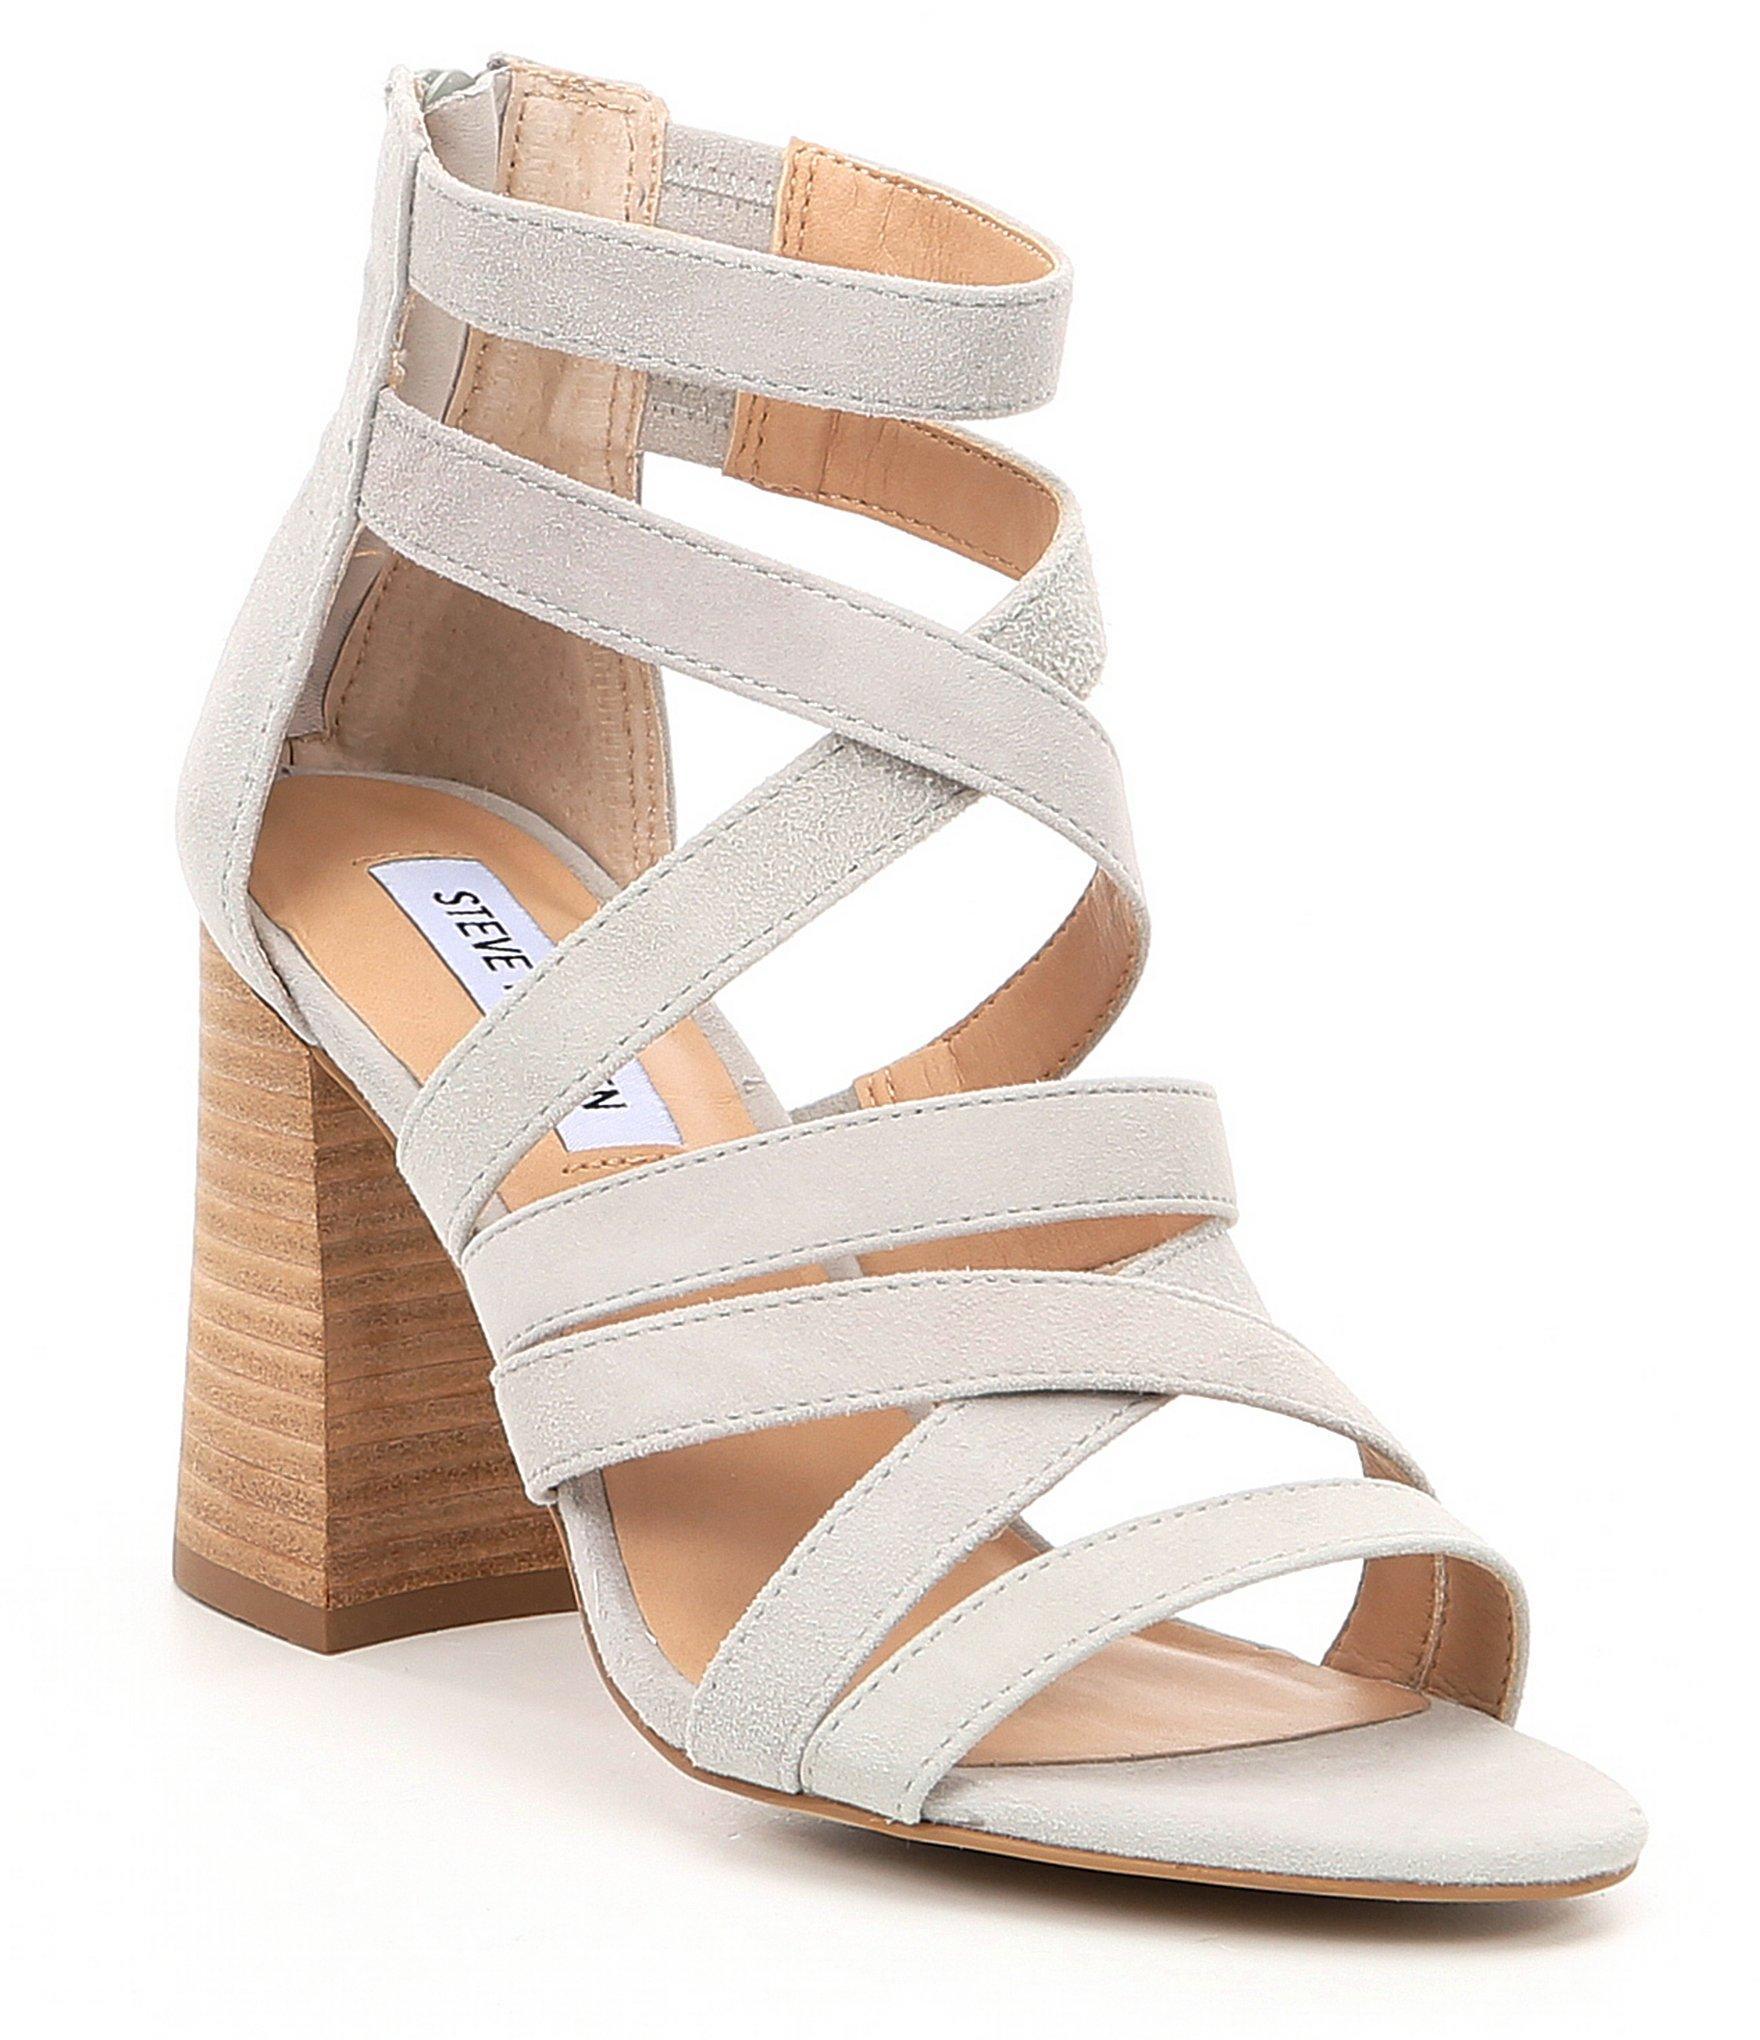 cdbbcca6444 Lyst - Steve Madden July Suede Block Heel Sandals in Gray